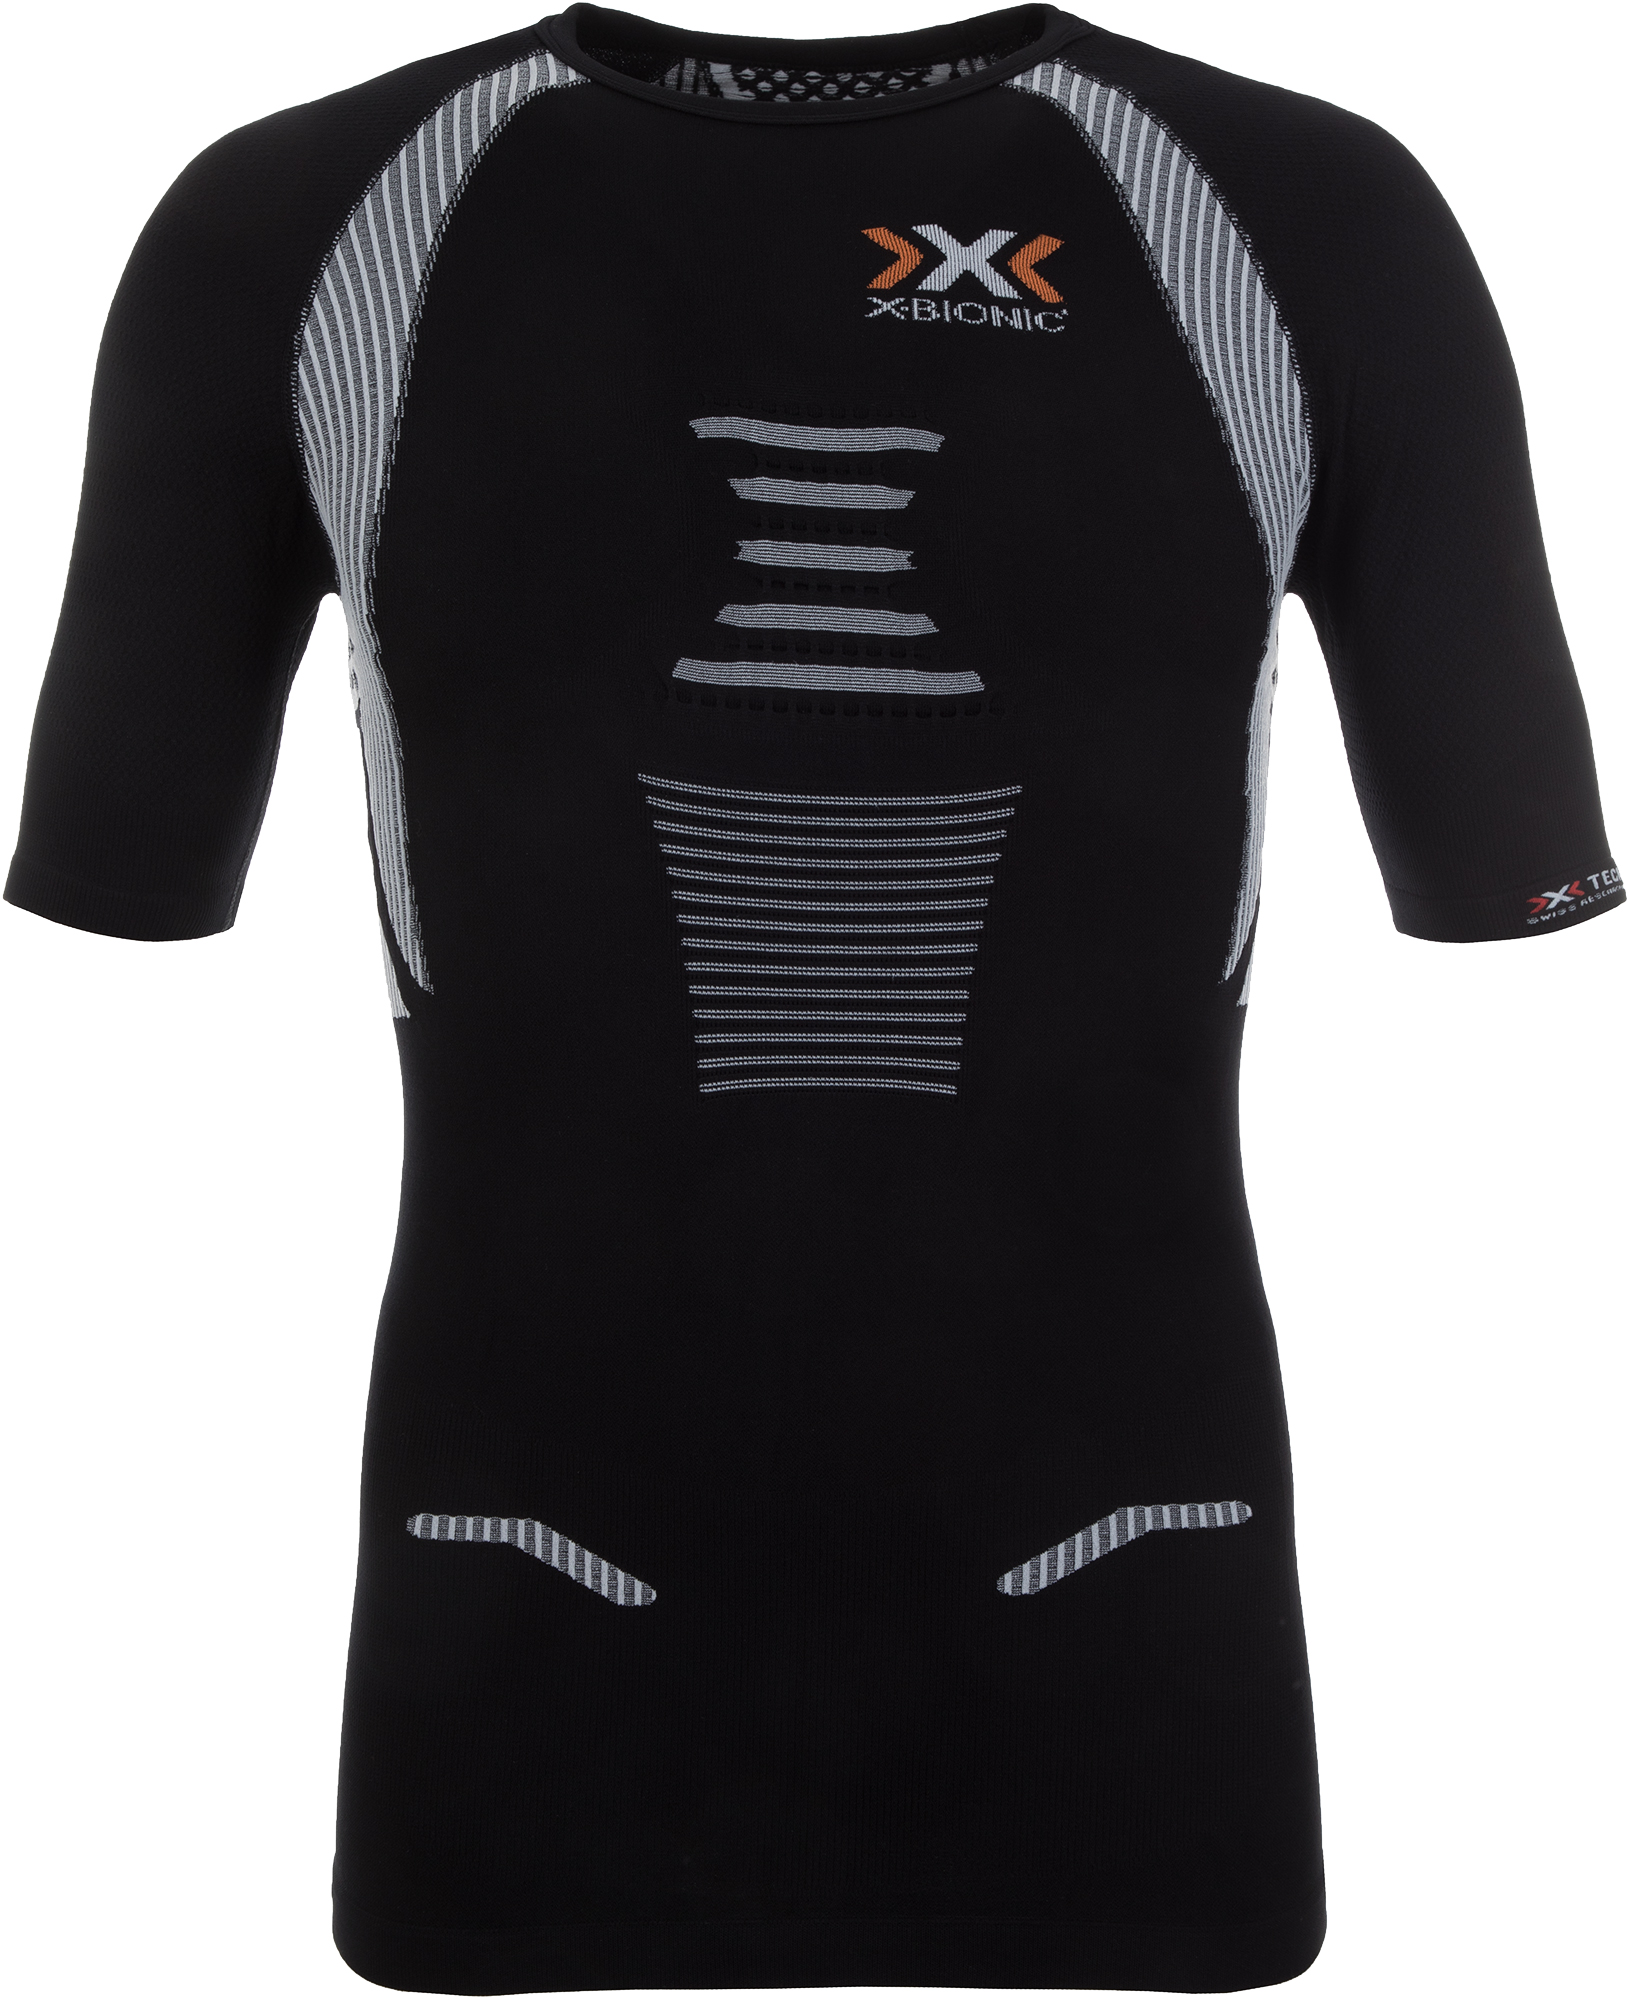 X-Bionic Футболка мужская X-Bionic The Trick Ow, размер 54 футболка x bionic x bionic effektor running powershirt®